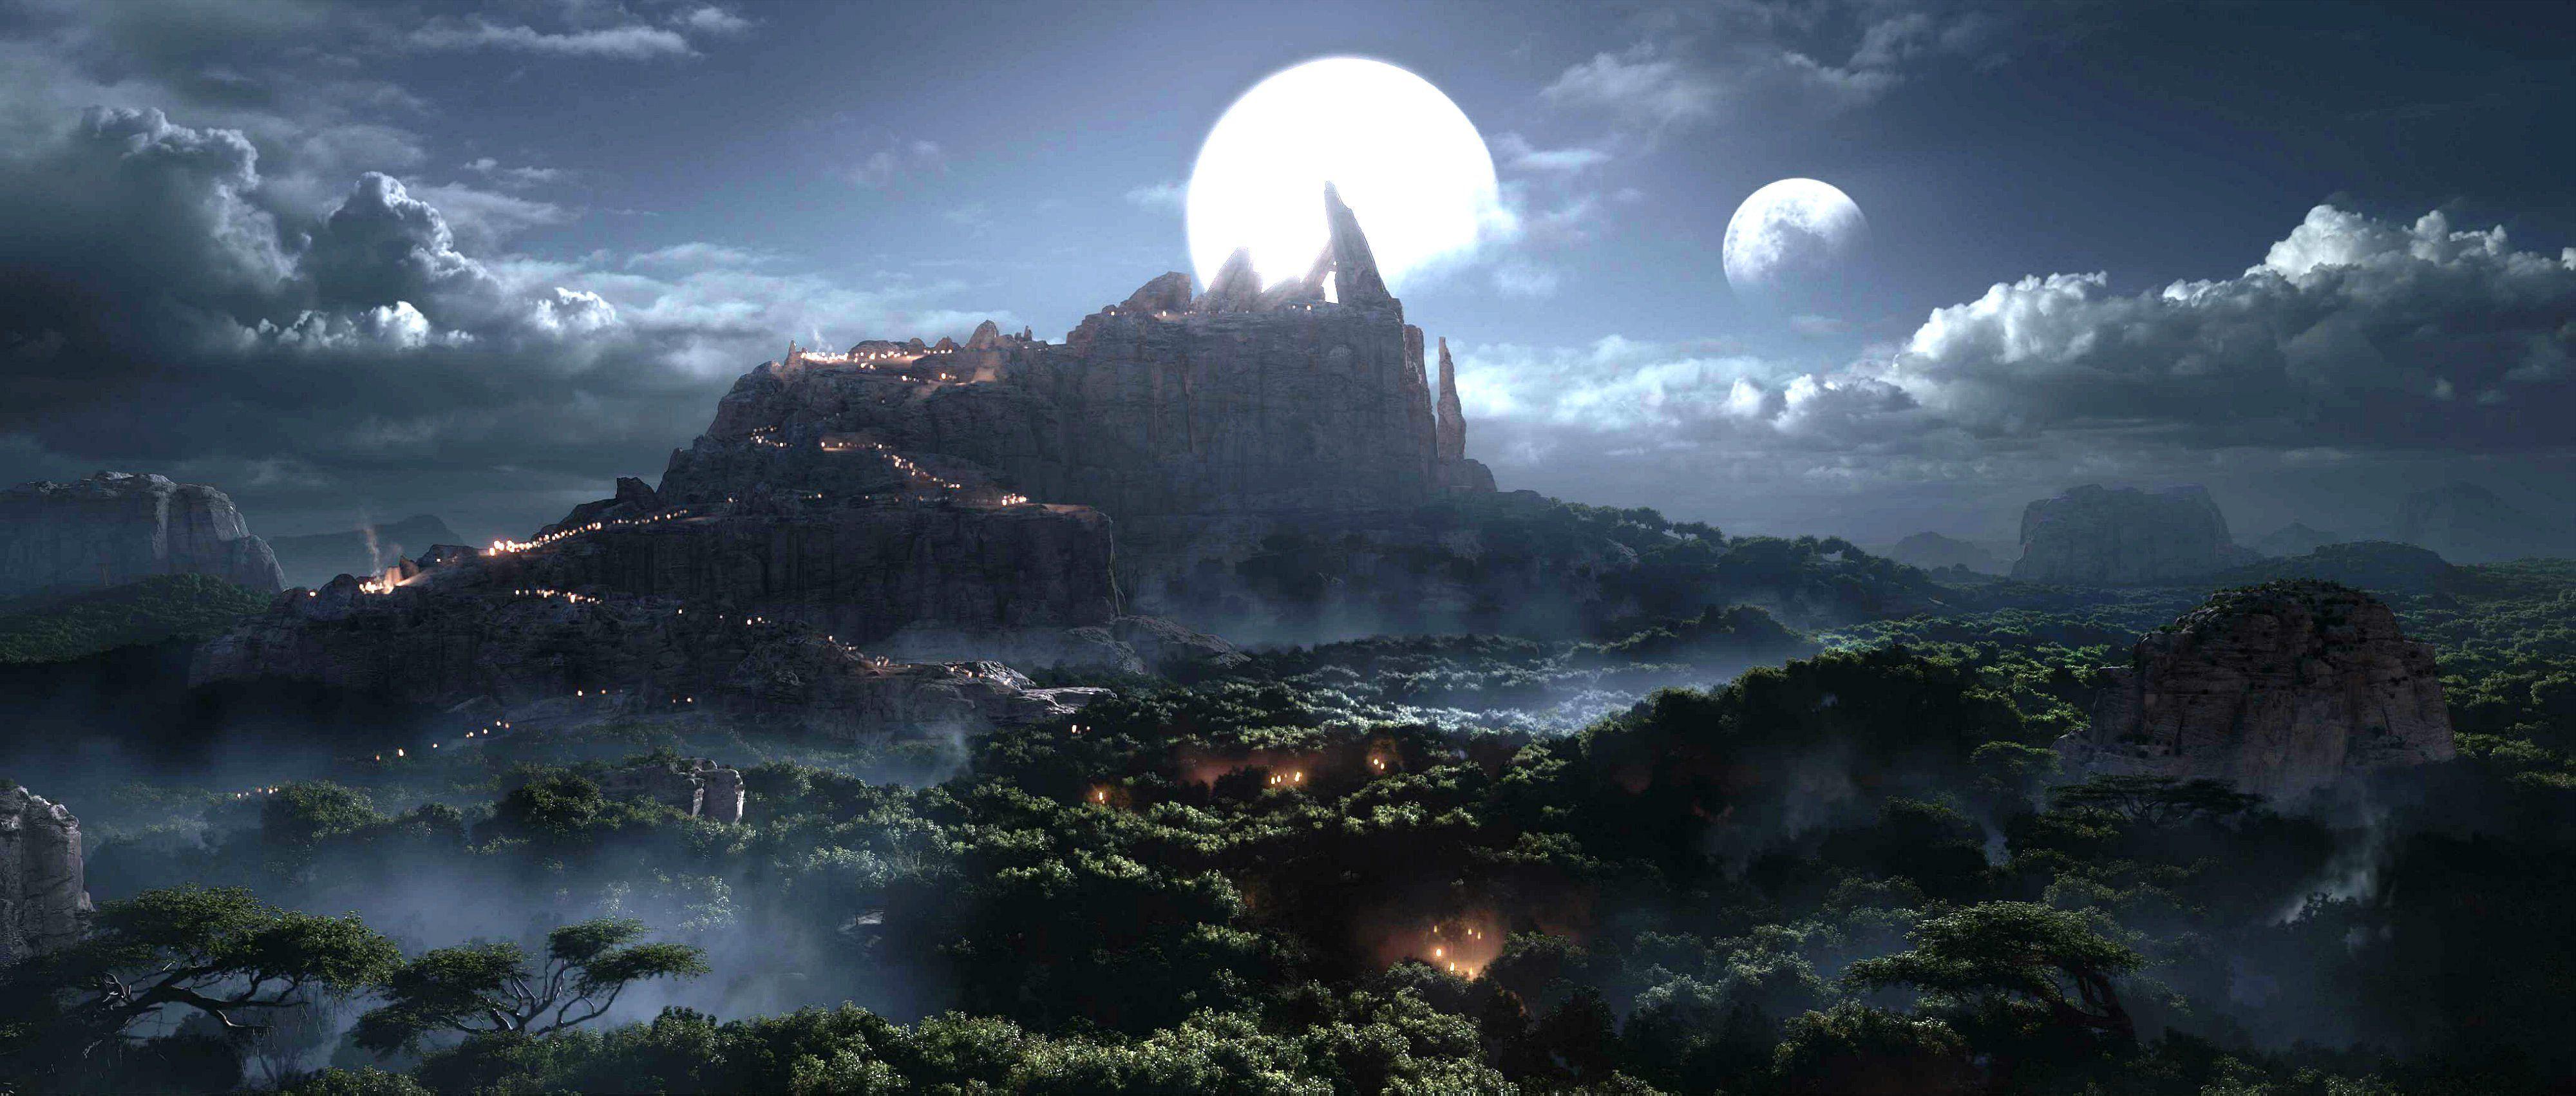 World Of Warcraft HD Wallpaper HD Wallpapers